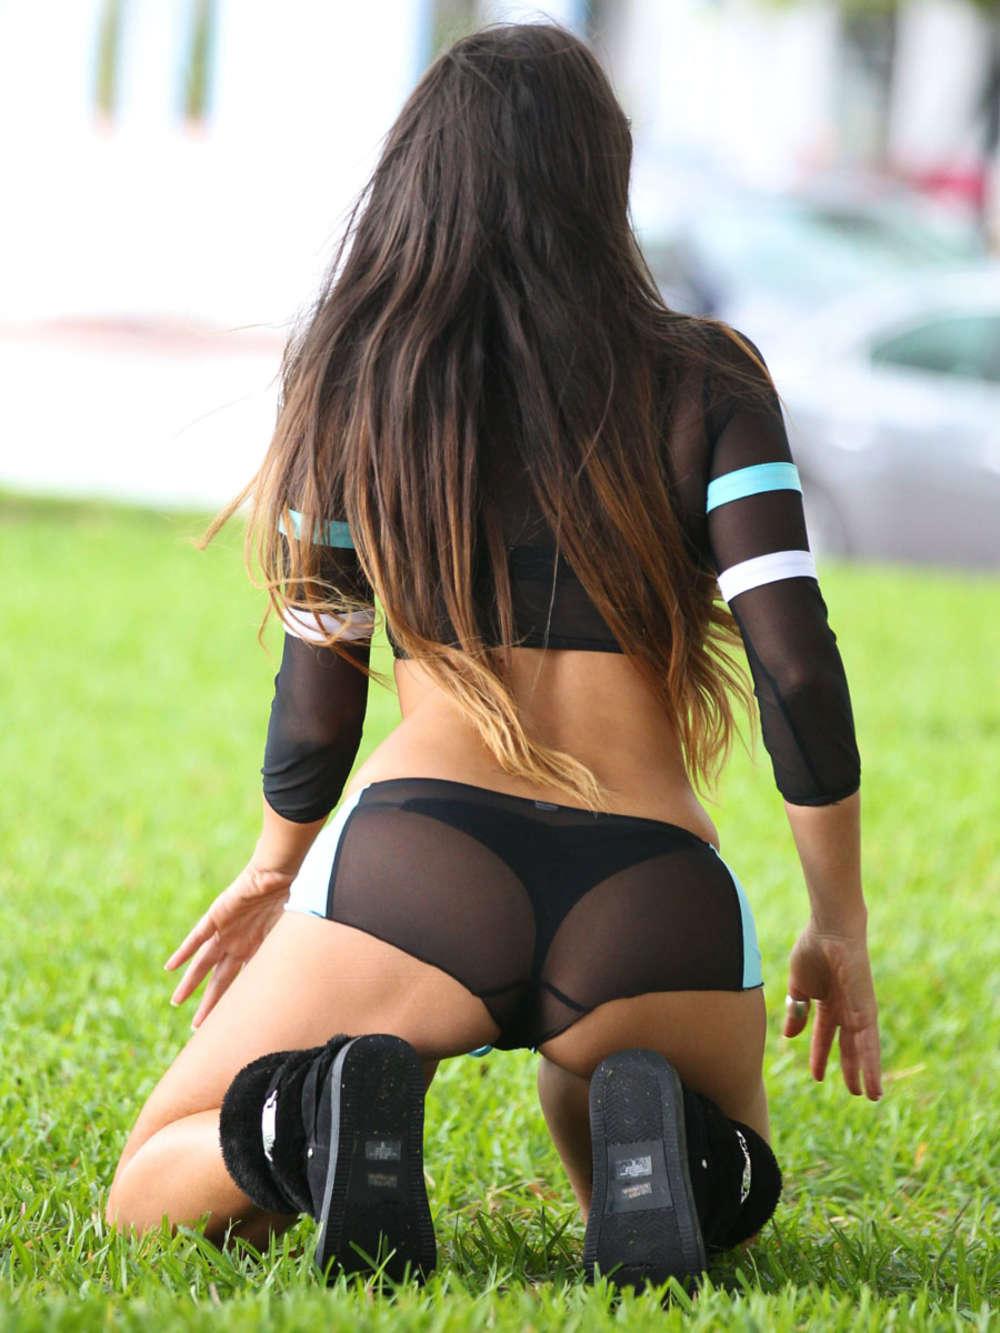 Claudia Romani Photoshoot in Miami